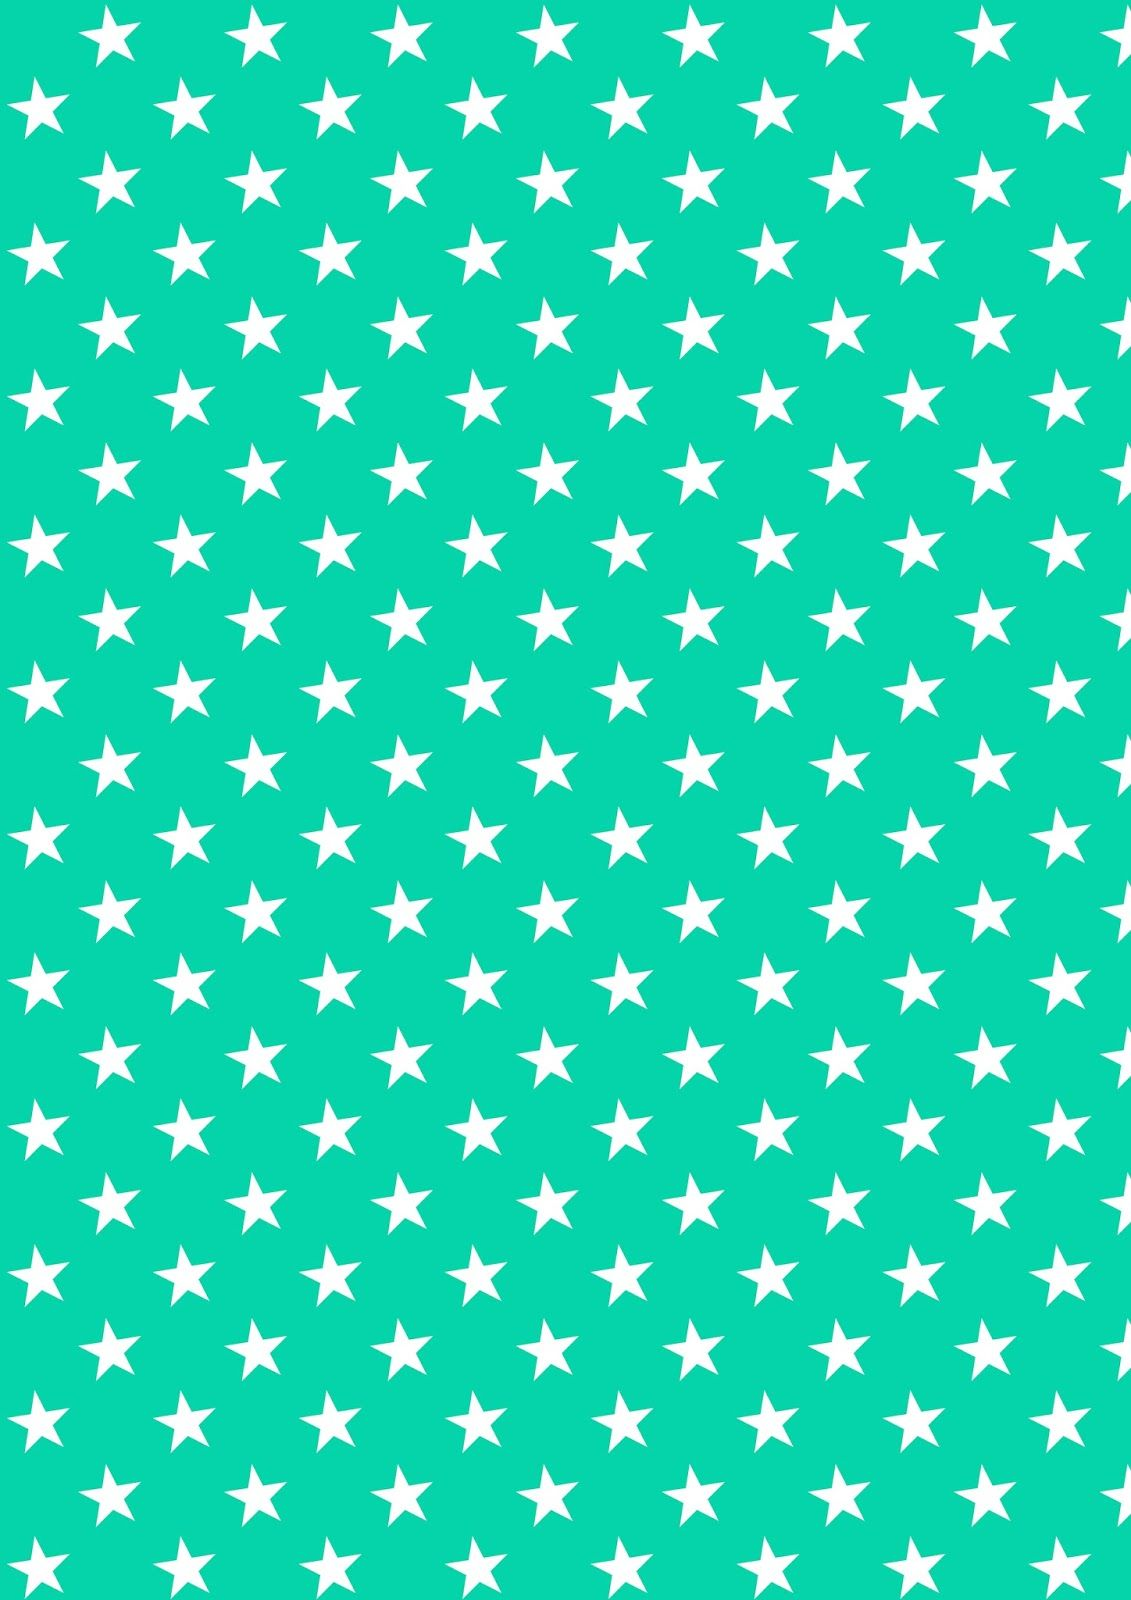 Worksheet Pattern Printable free digital chevron scrapbooking papers ausdruckbares printable white stars on green pattern paper